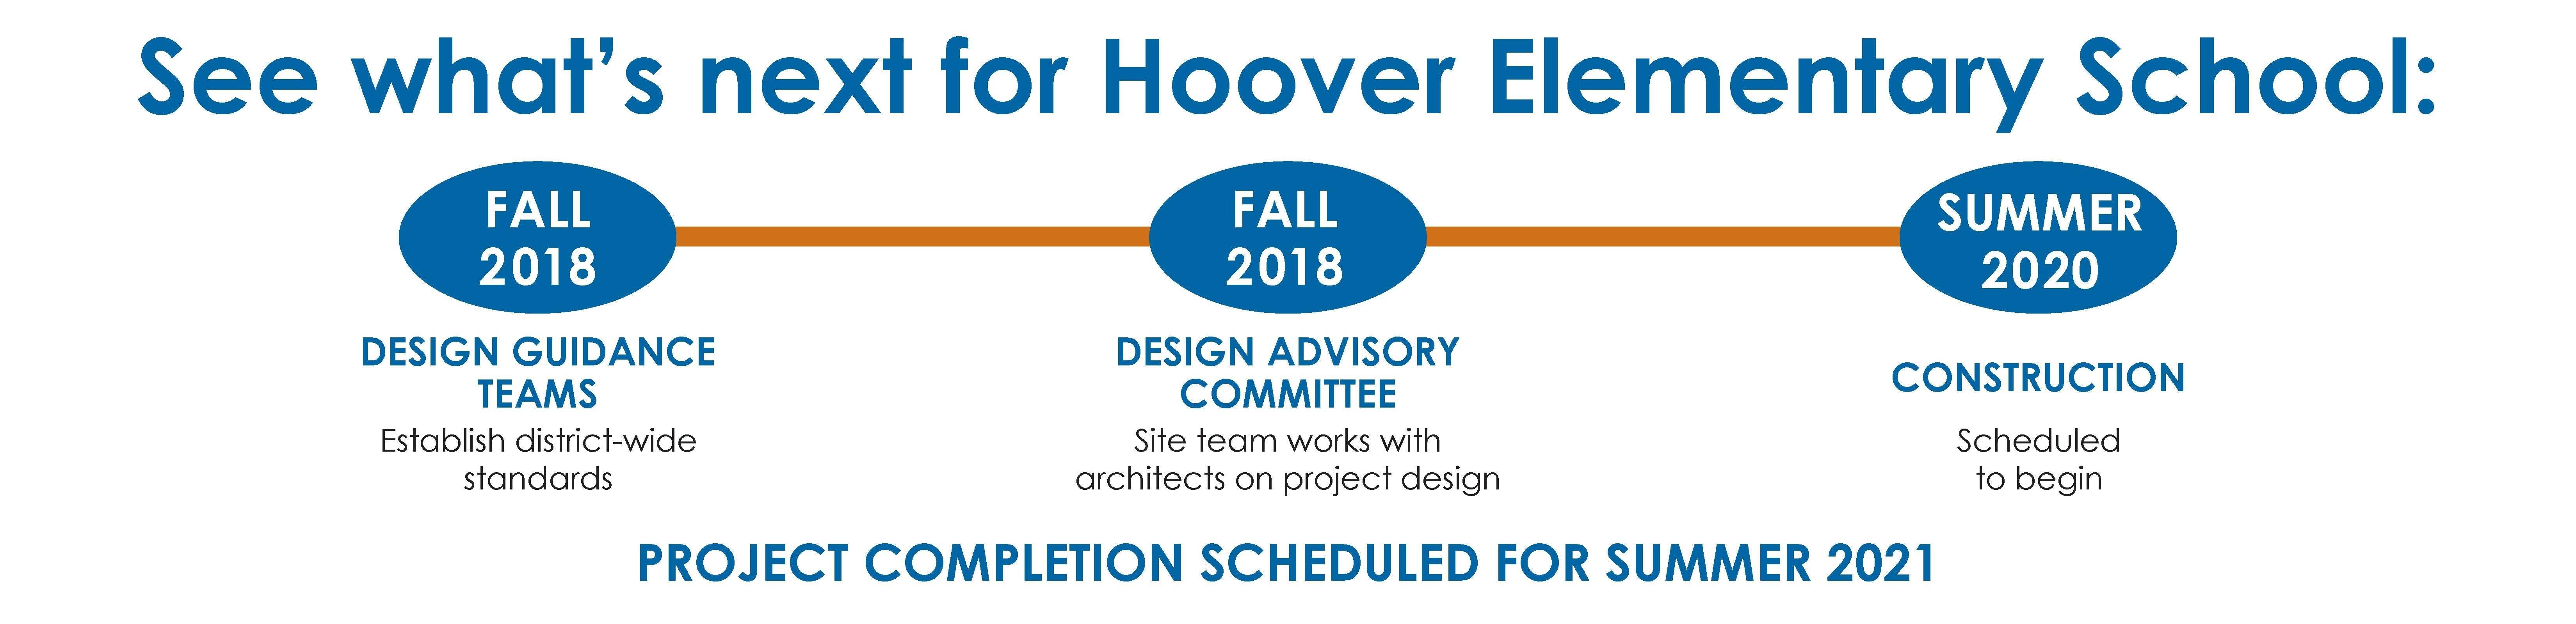 Hoover Elementary - Corvallis School District 509J Calendar 2019